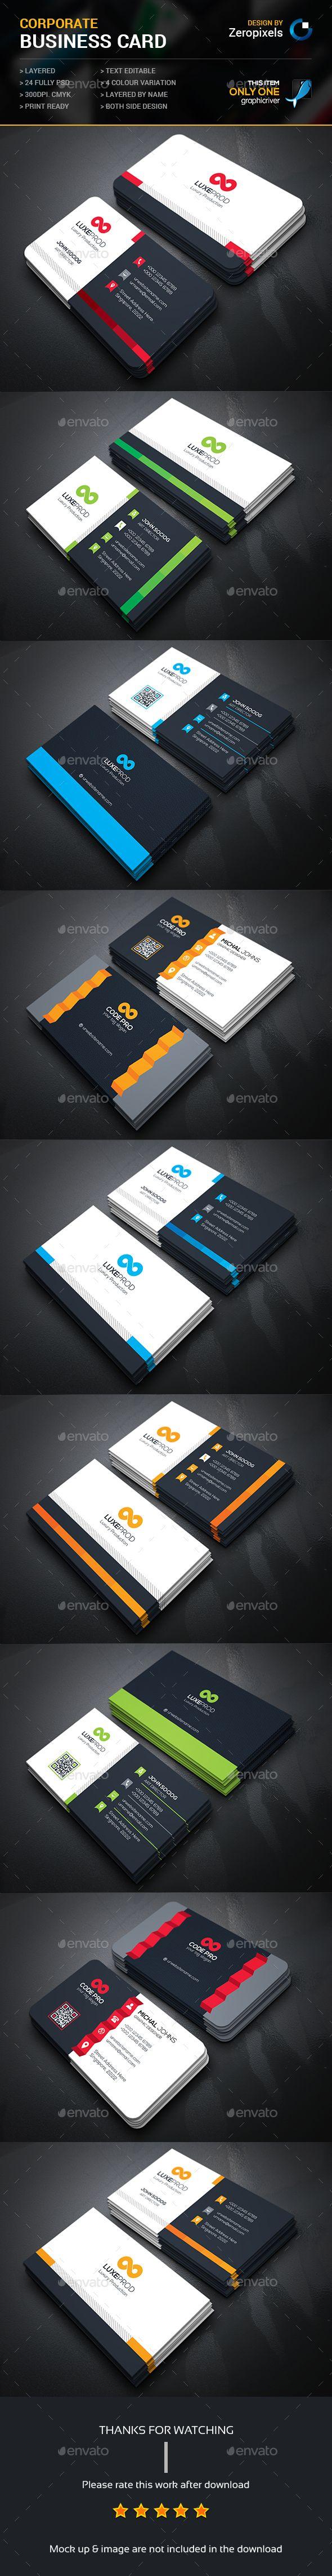 Corporate Business Card Bundle Templates PSD. Download here: http://graphicriver.net/item/corporate-business-card-bundle/15980392?ref=ksioks